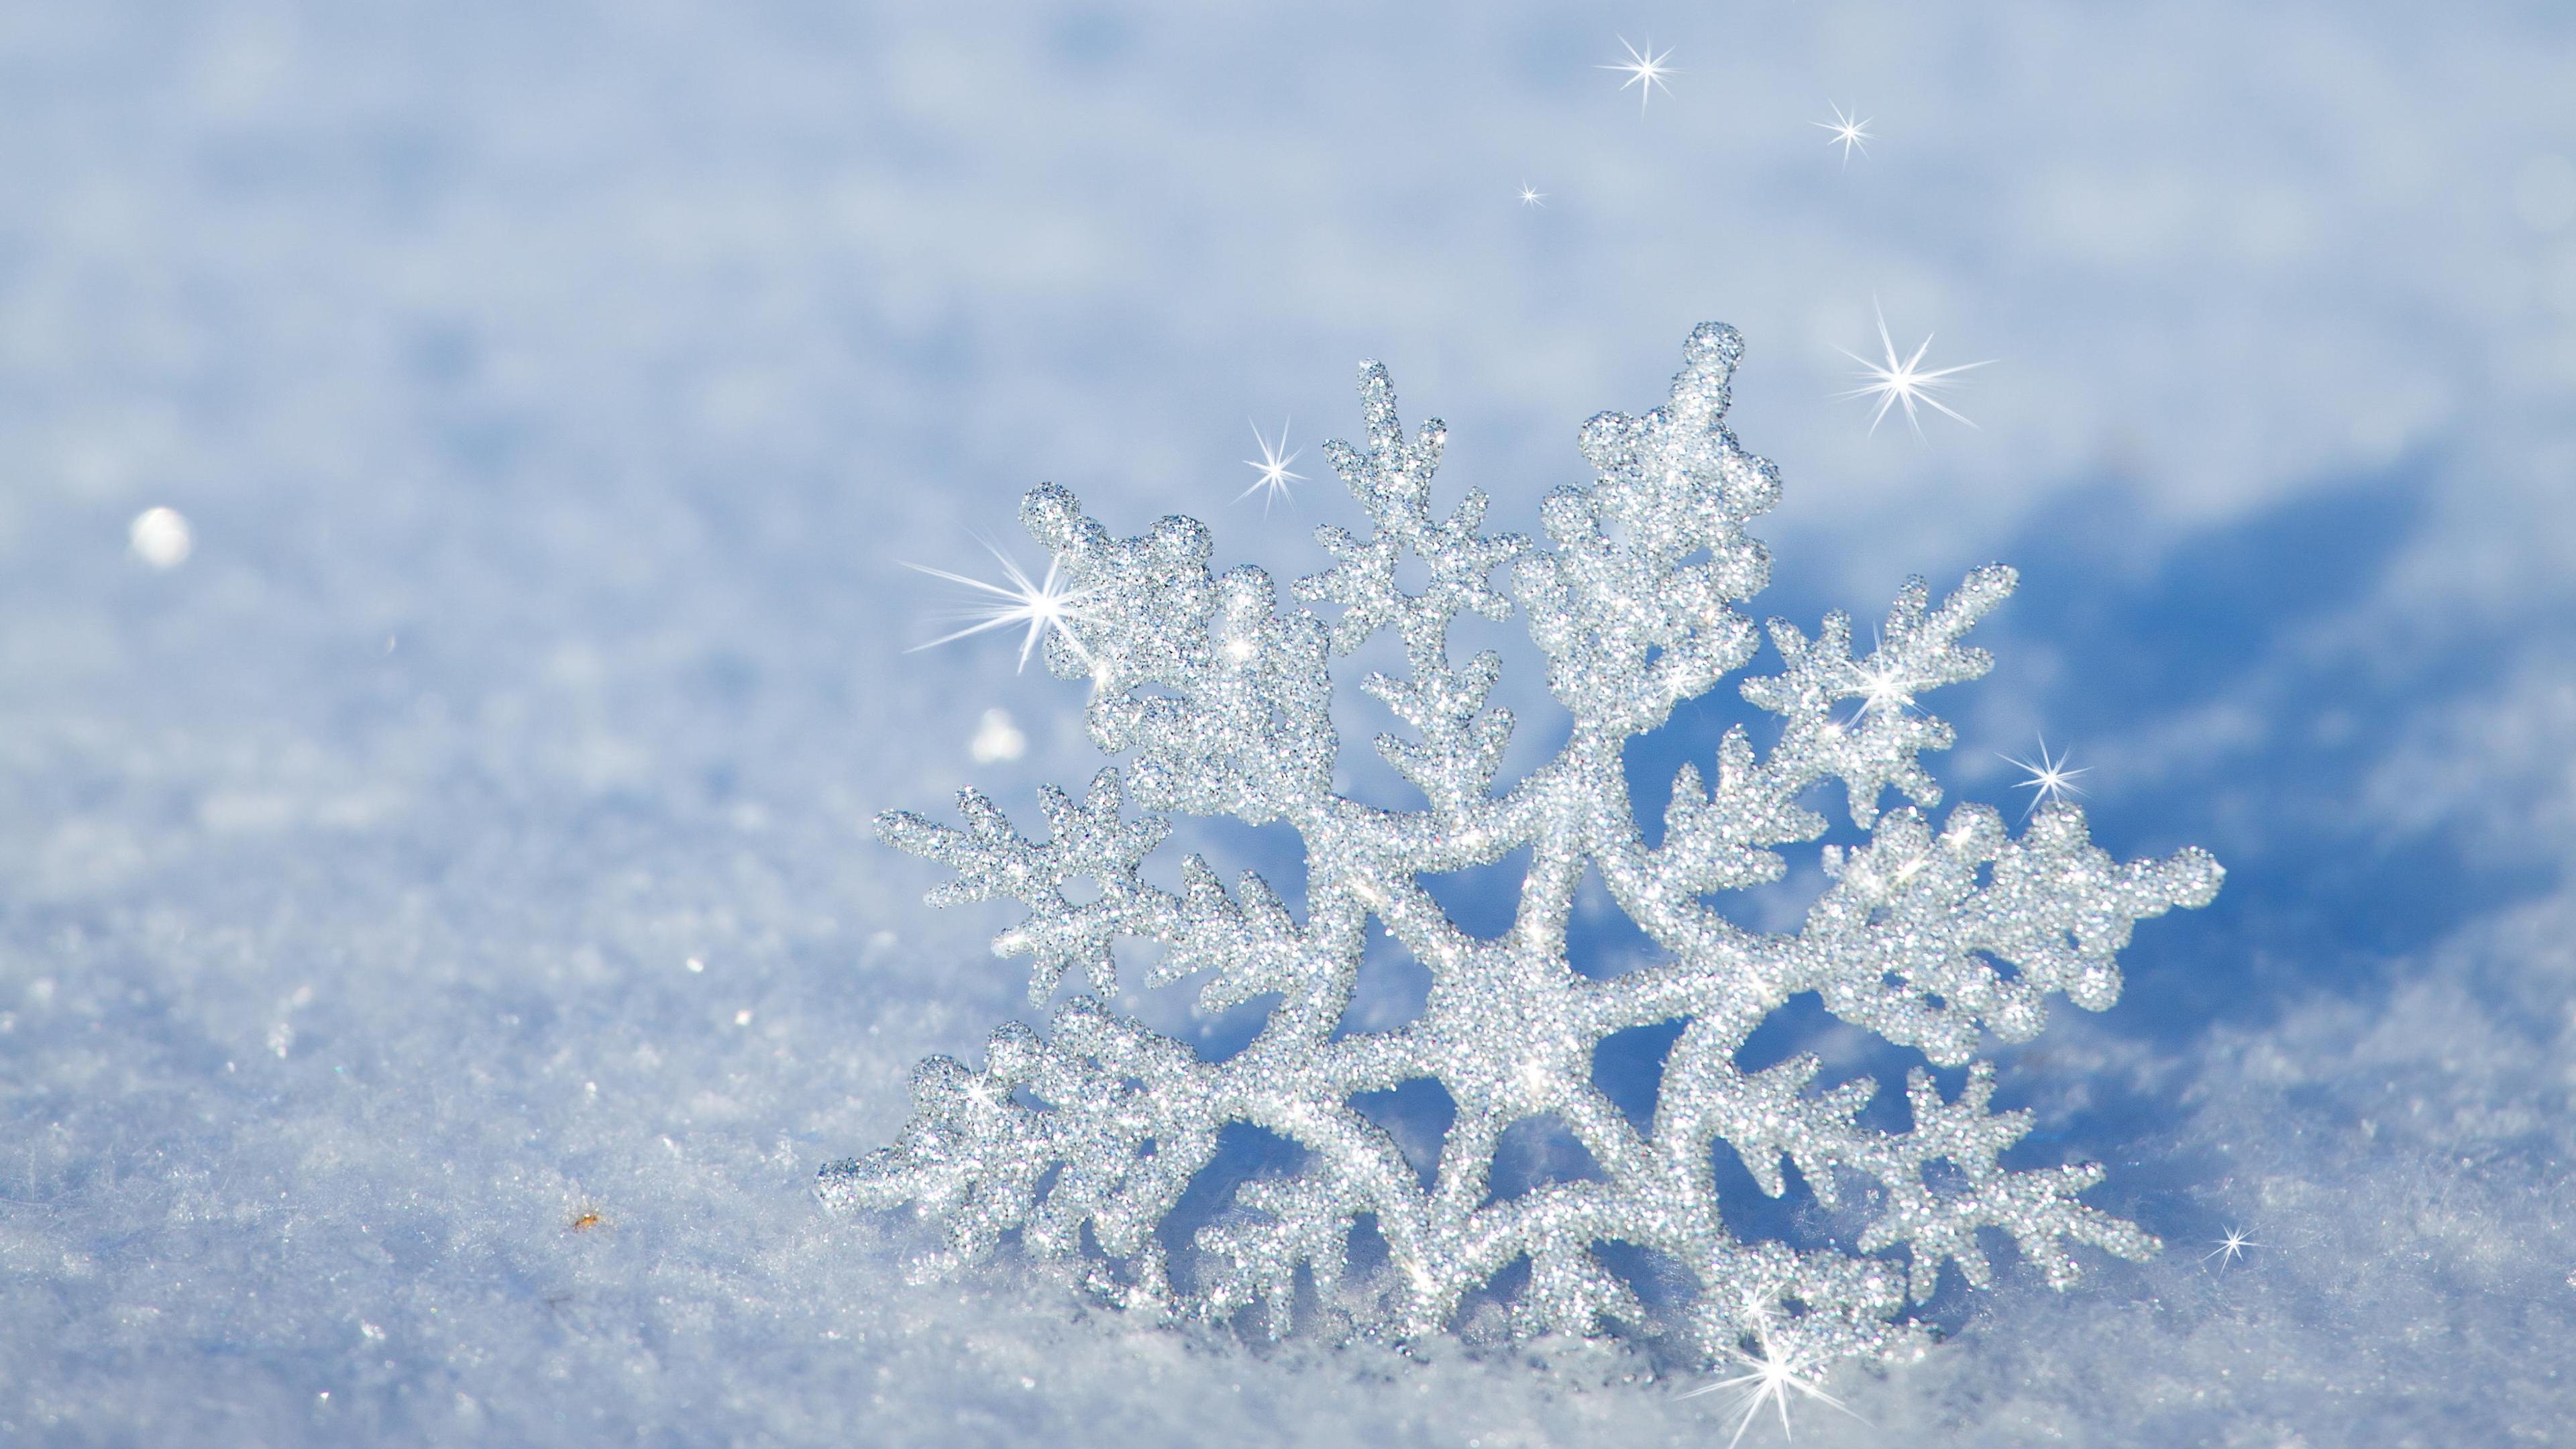 3d Snowflake In The Snow Hd Winter Wallpaper Wallpaper